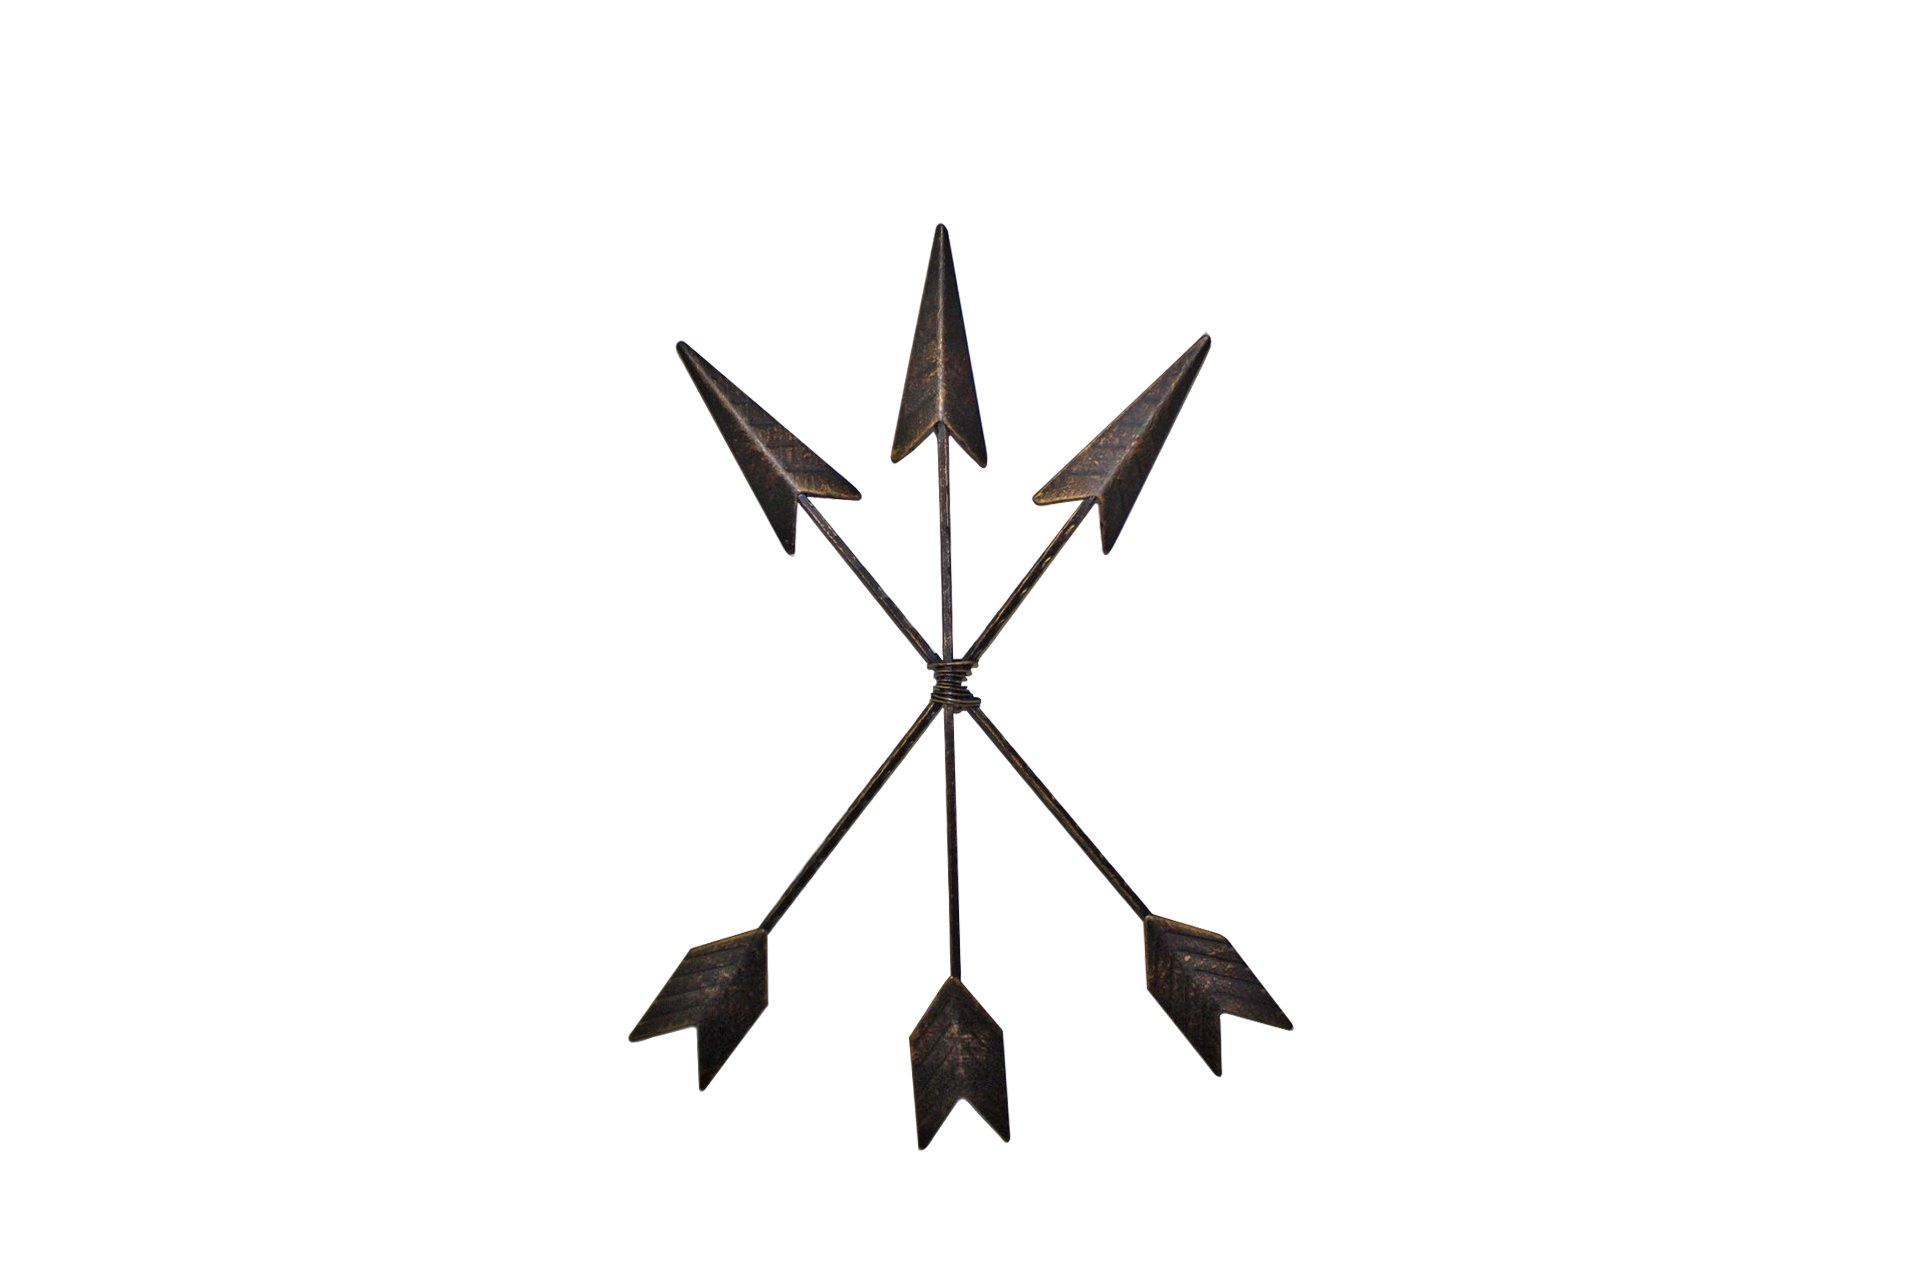 Cast Iron Arrow Wall Decor set of 3 Native American Metal Arrows | Rustic Barn Wood Decorative Sign Room Decor | Farmhouse Decor + Home Decor Accents| Metal Wall Art | Metal Wall Decor | Bedroom Decor